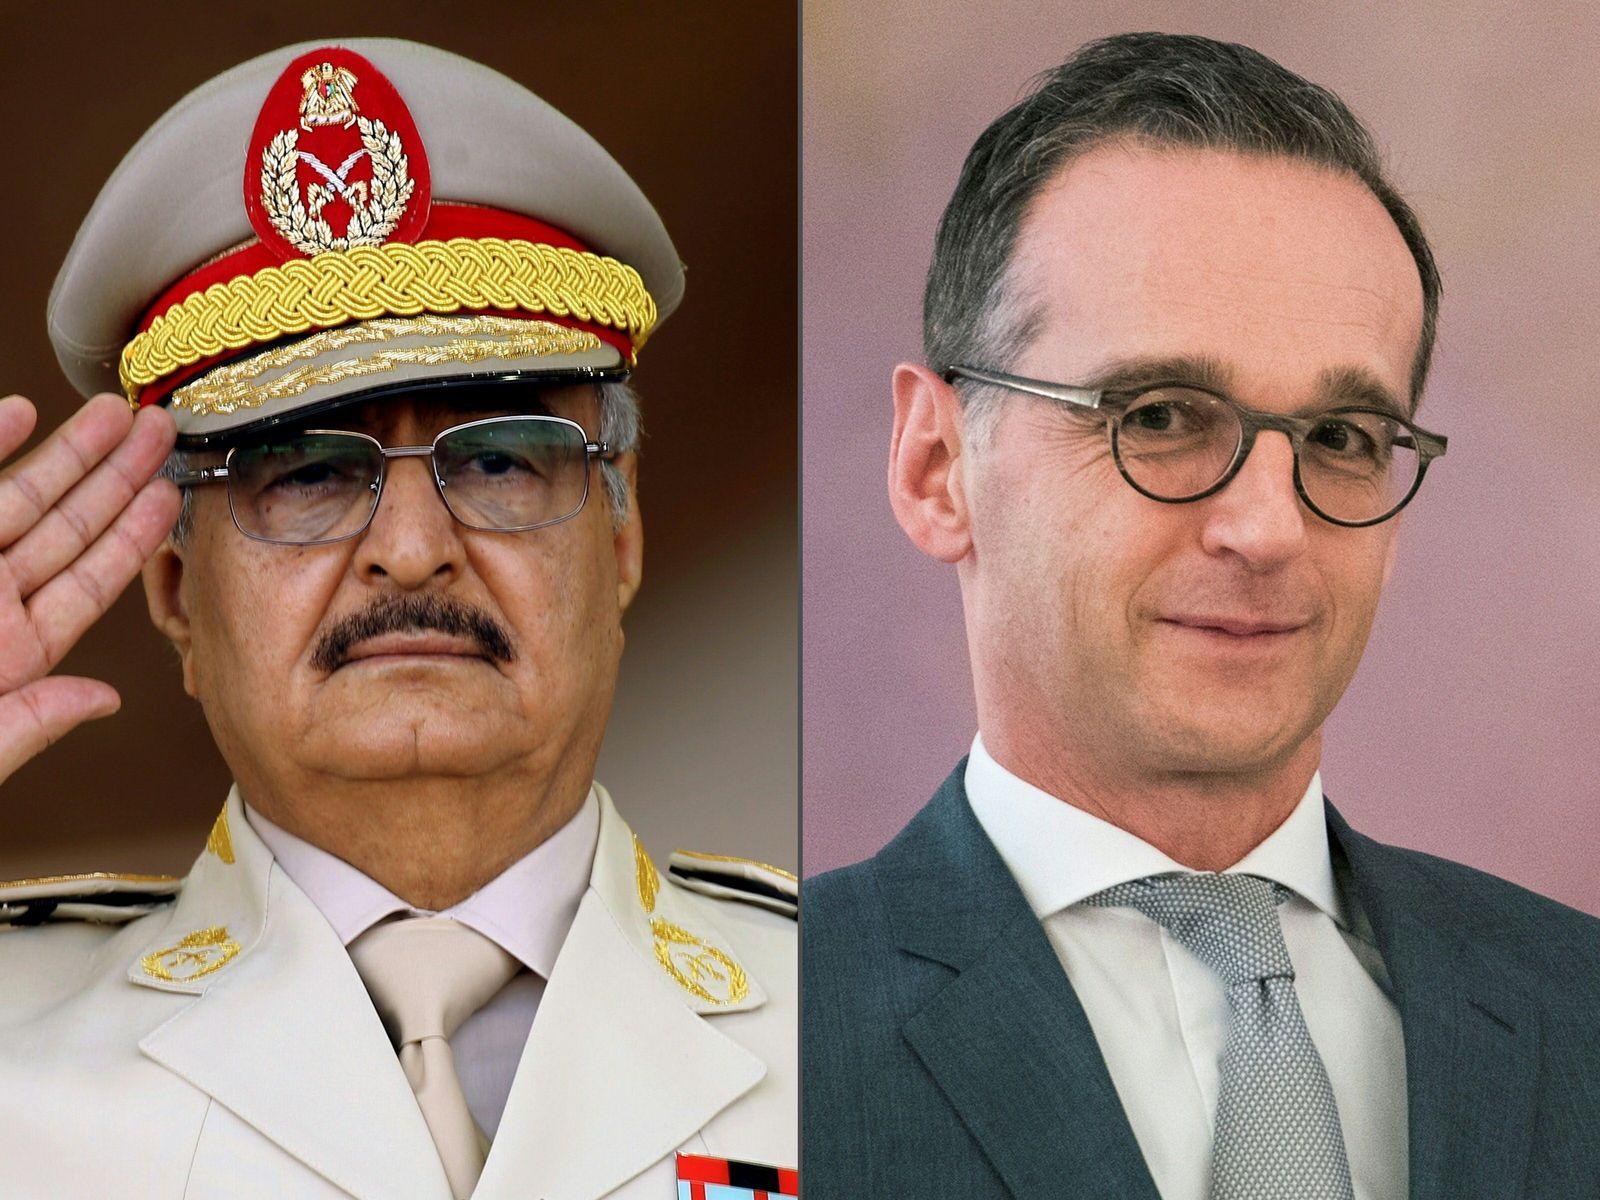 COMBO-GERMANY-LIBYA-UN-DIPLOMACY-CONFLICT